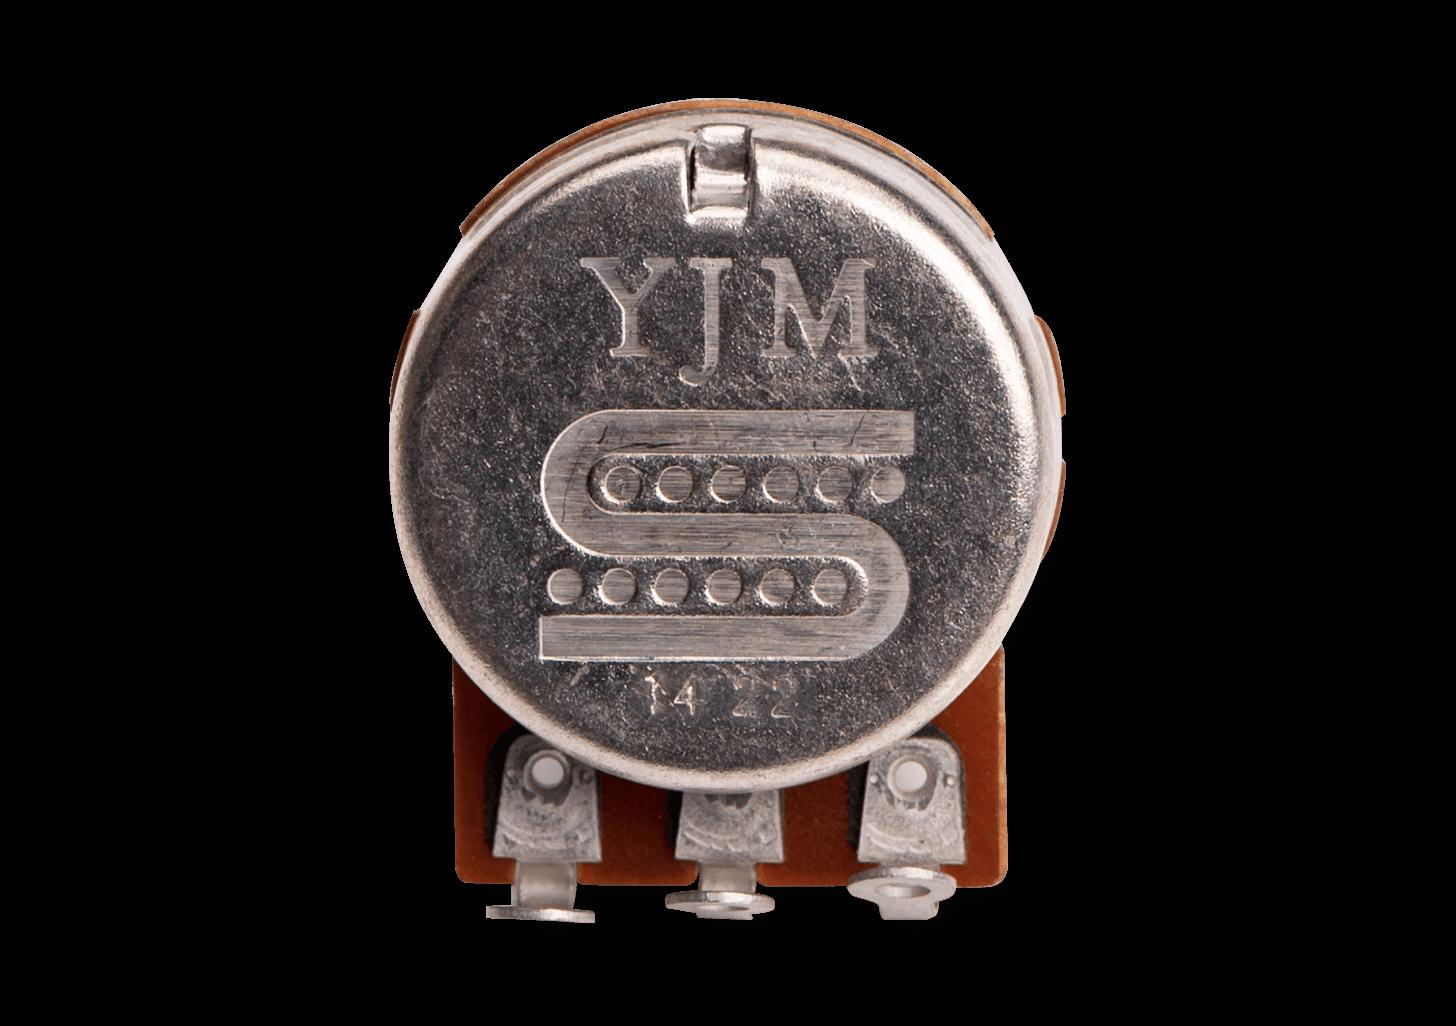 Potenciômetro 500K YJM logo 11807-50-500 -YJM-500 - SEYMOUR DUNCAN